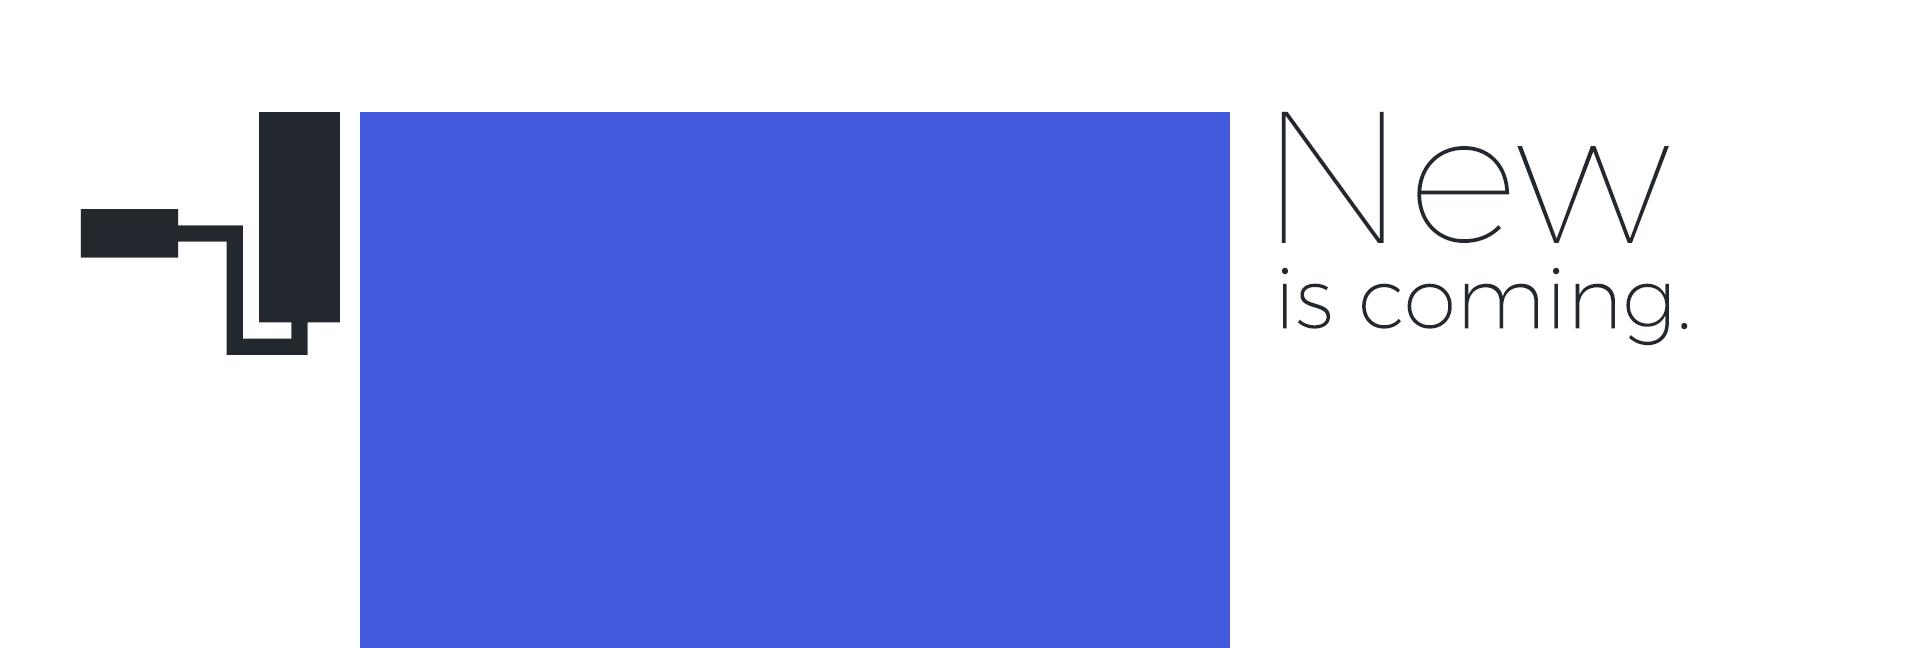 Futuramo Tasks Beta – new is coming